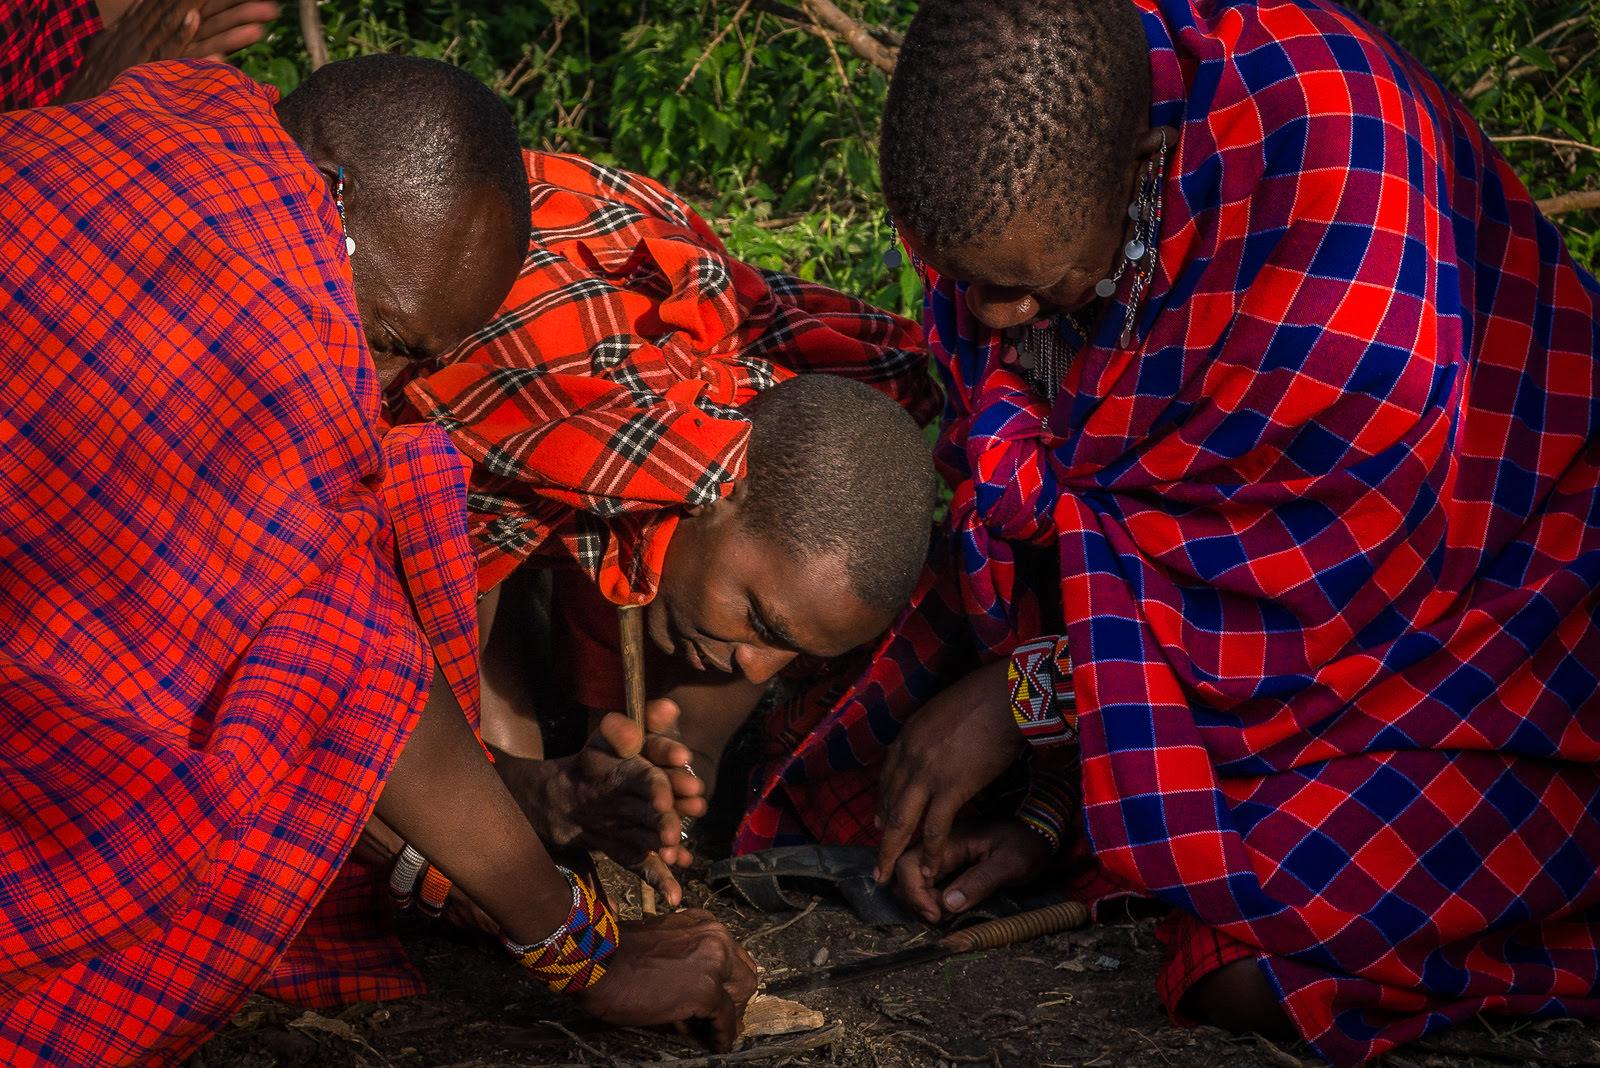 the Maasai lighting a fire by hand